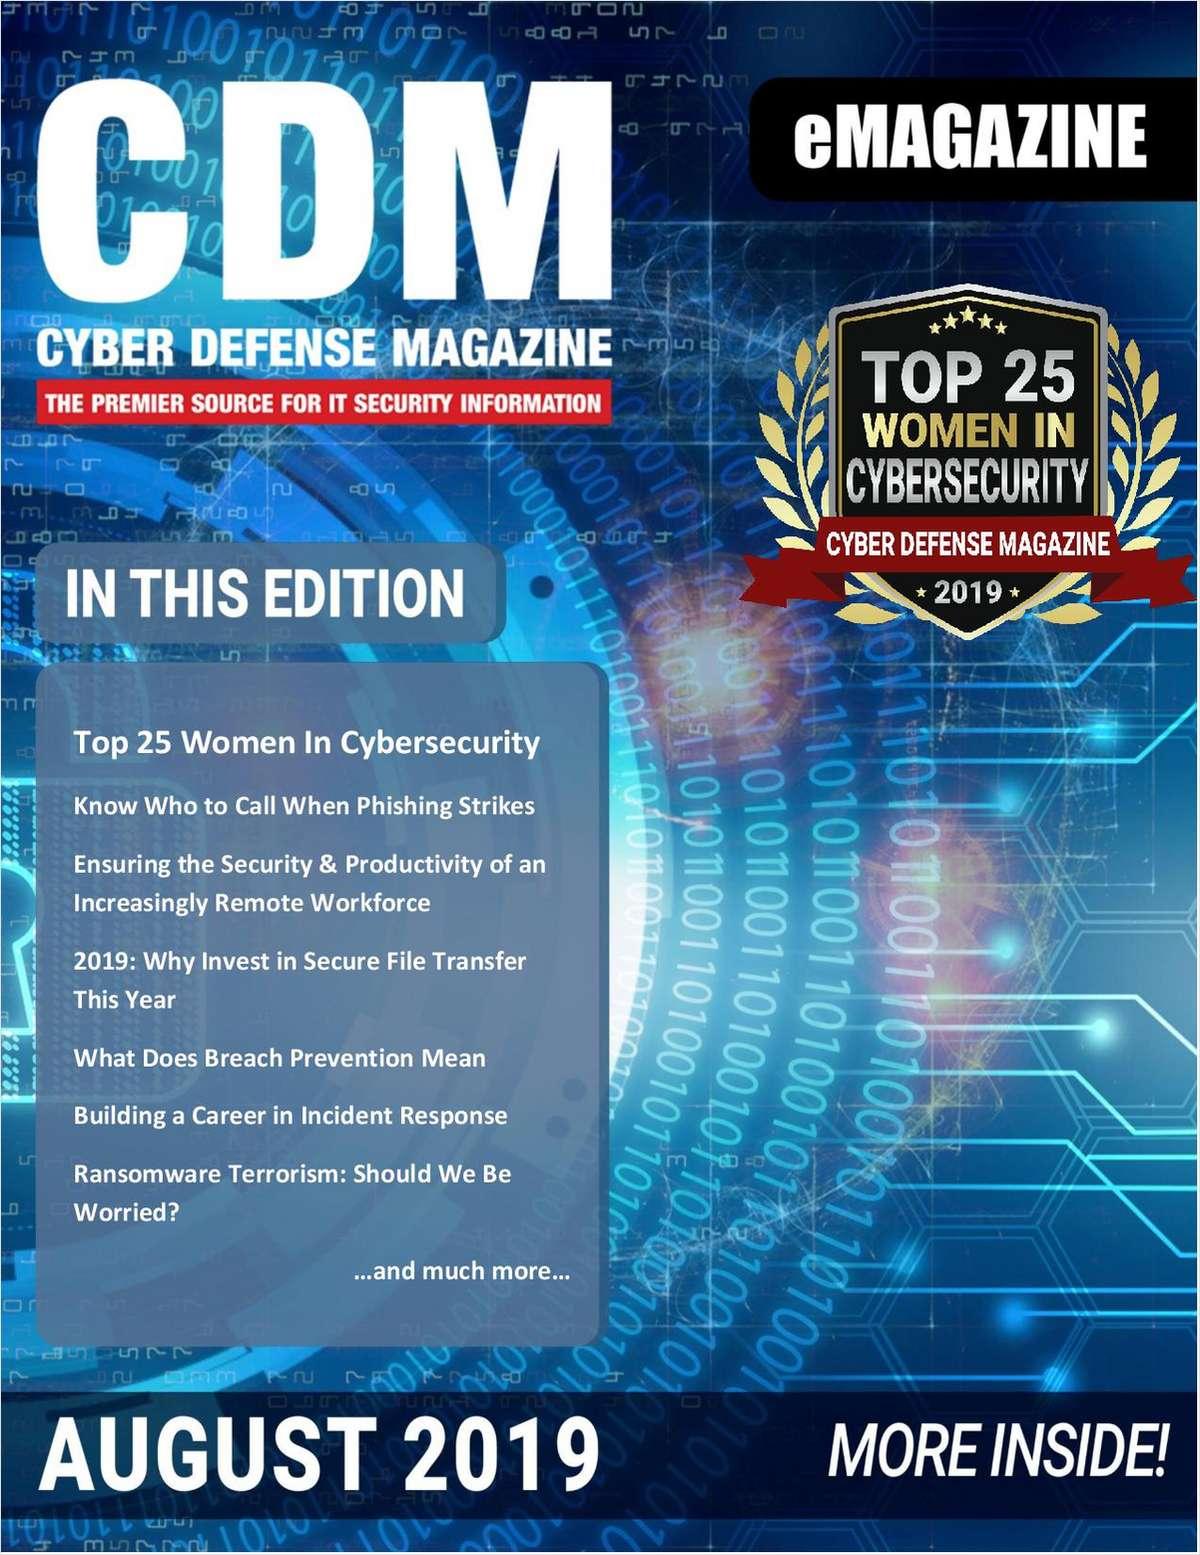 Cyber Defense eMagazine - August 2019 Edition